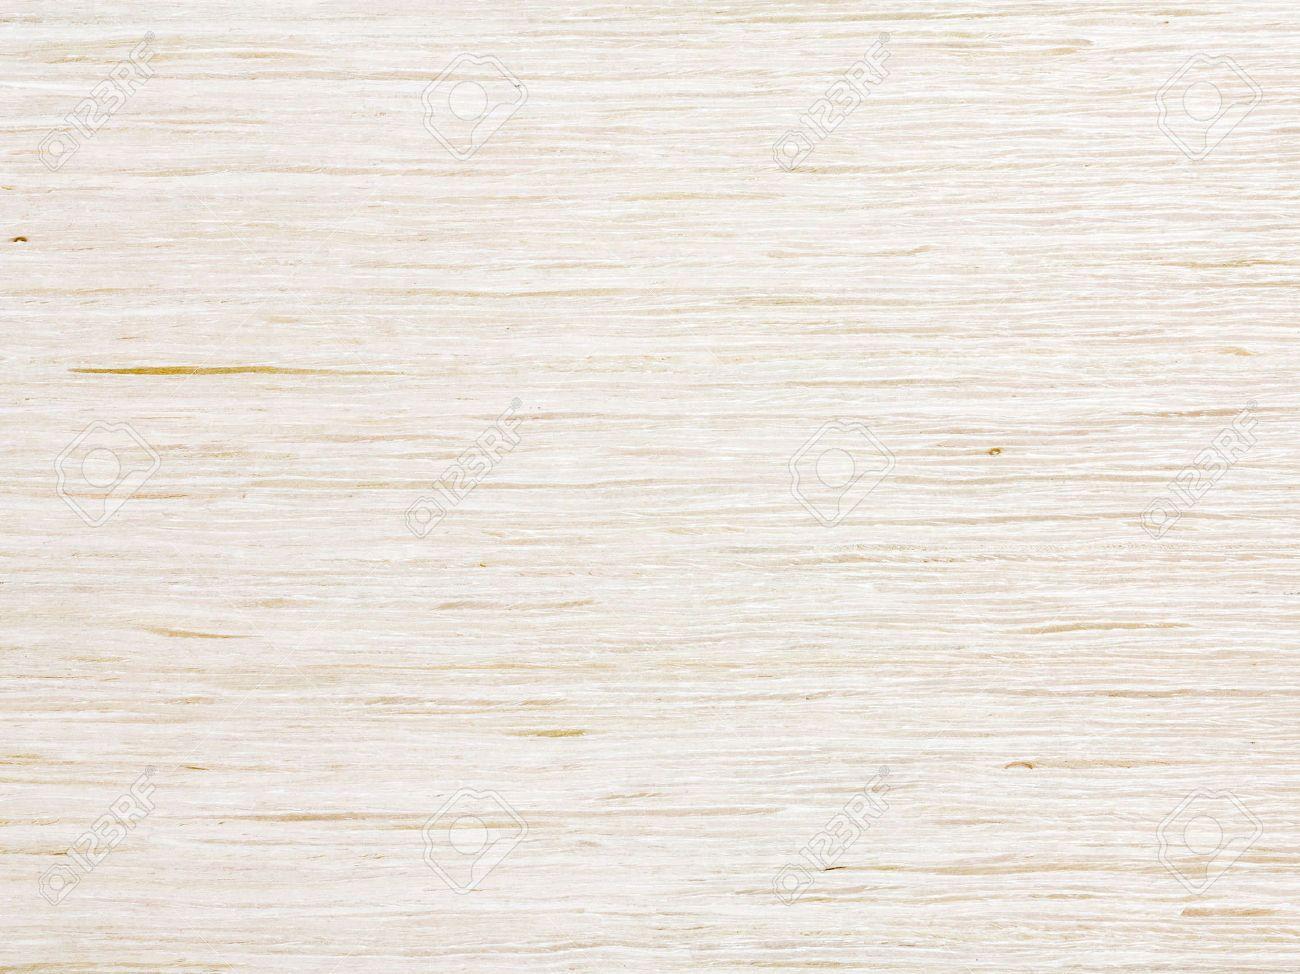 Wood oak bleached pinterest woods